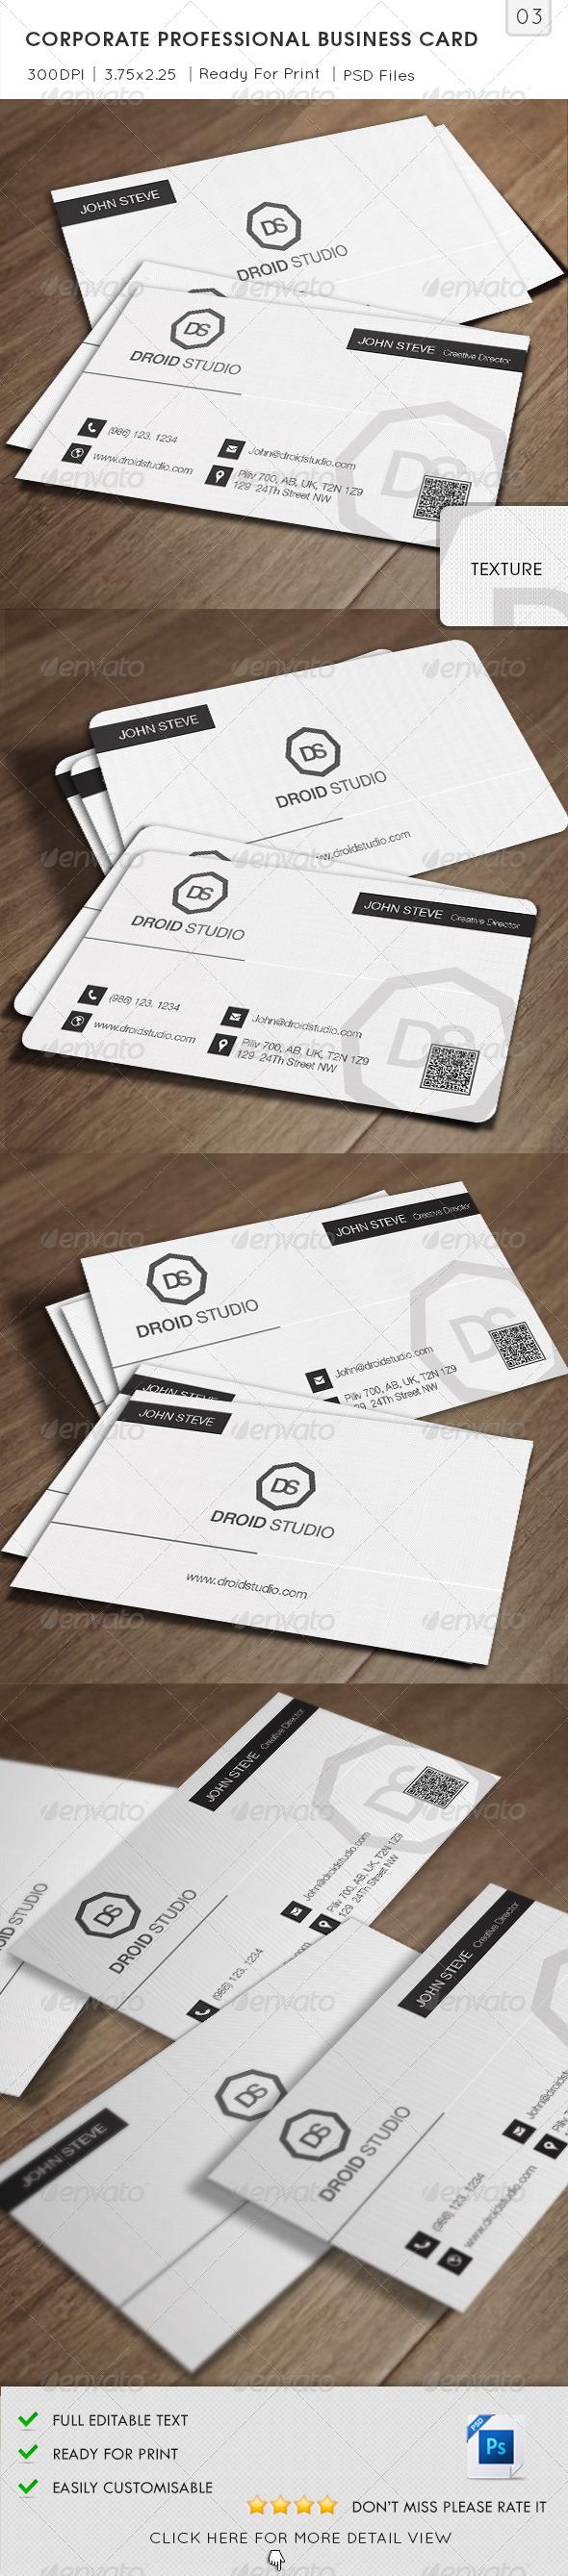 GraphicRiver Corporate Business Card v03 5752457